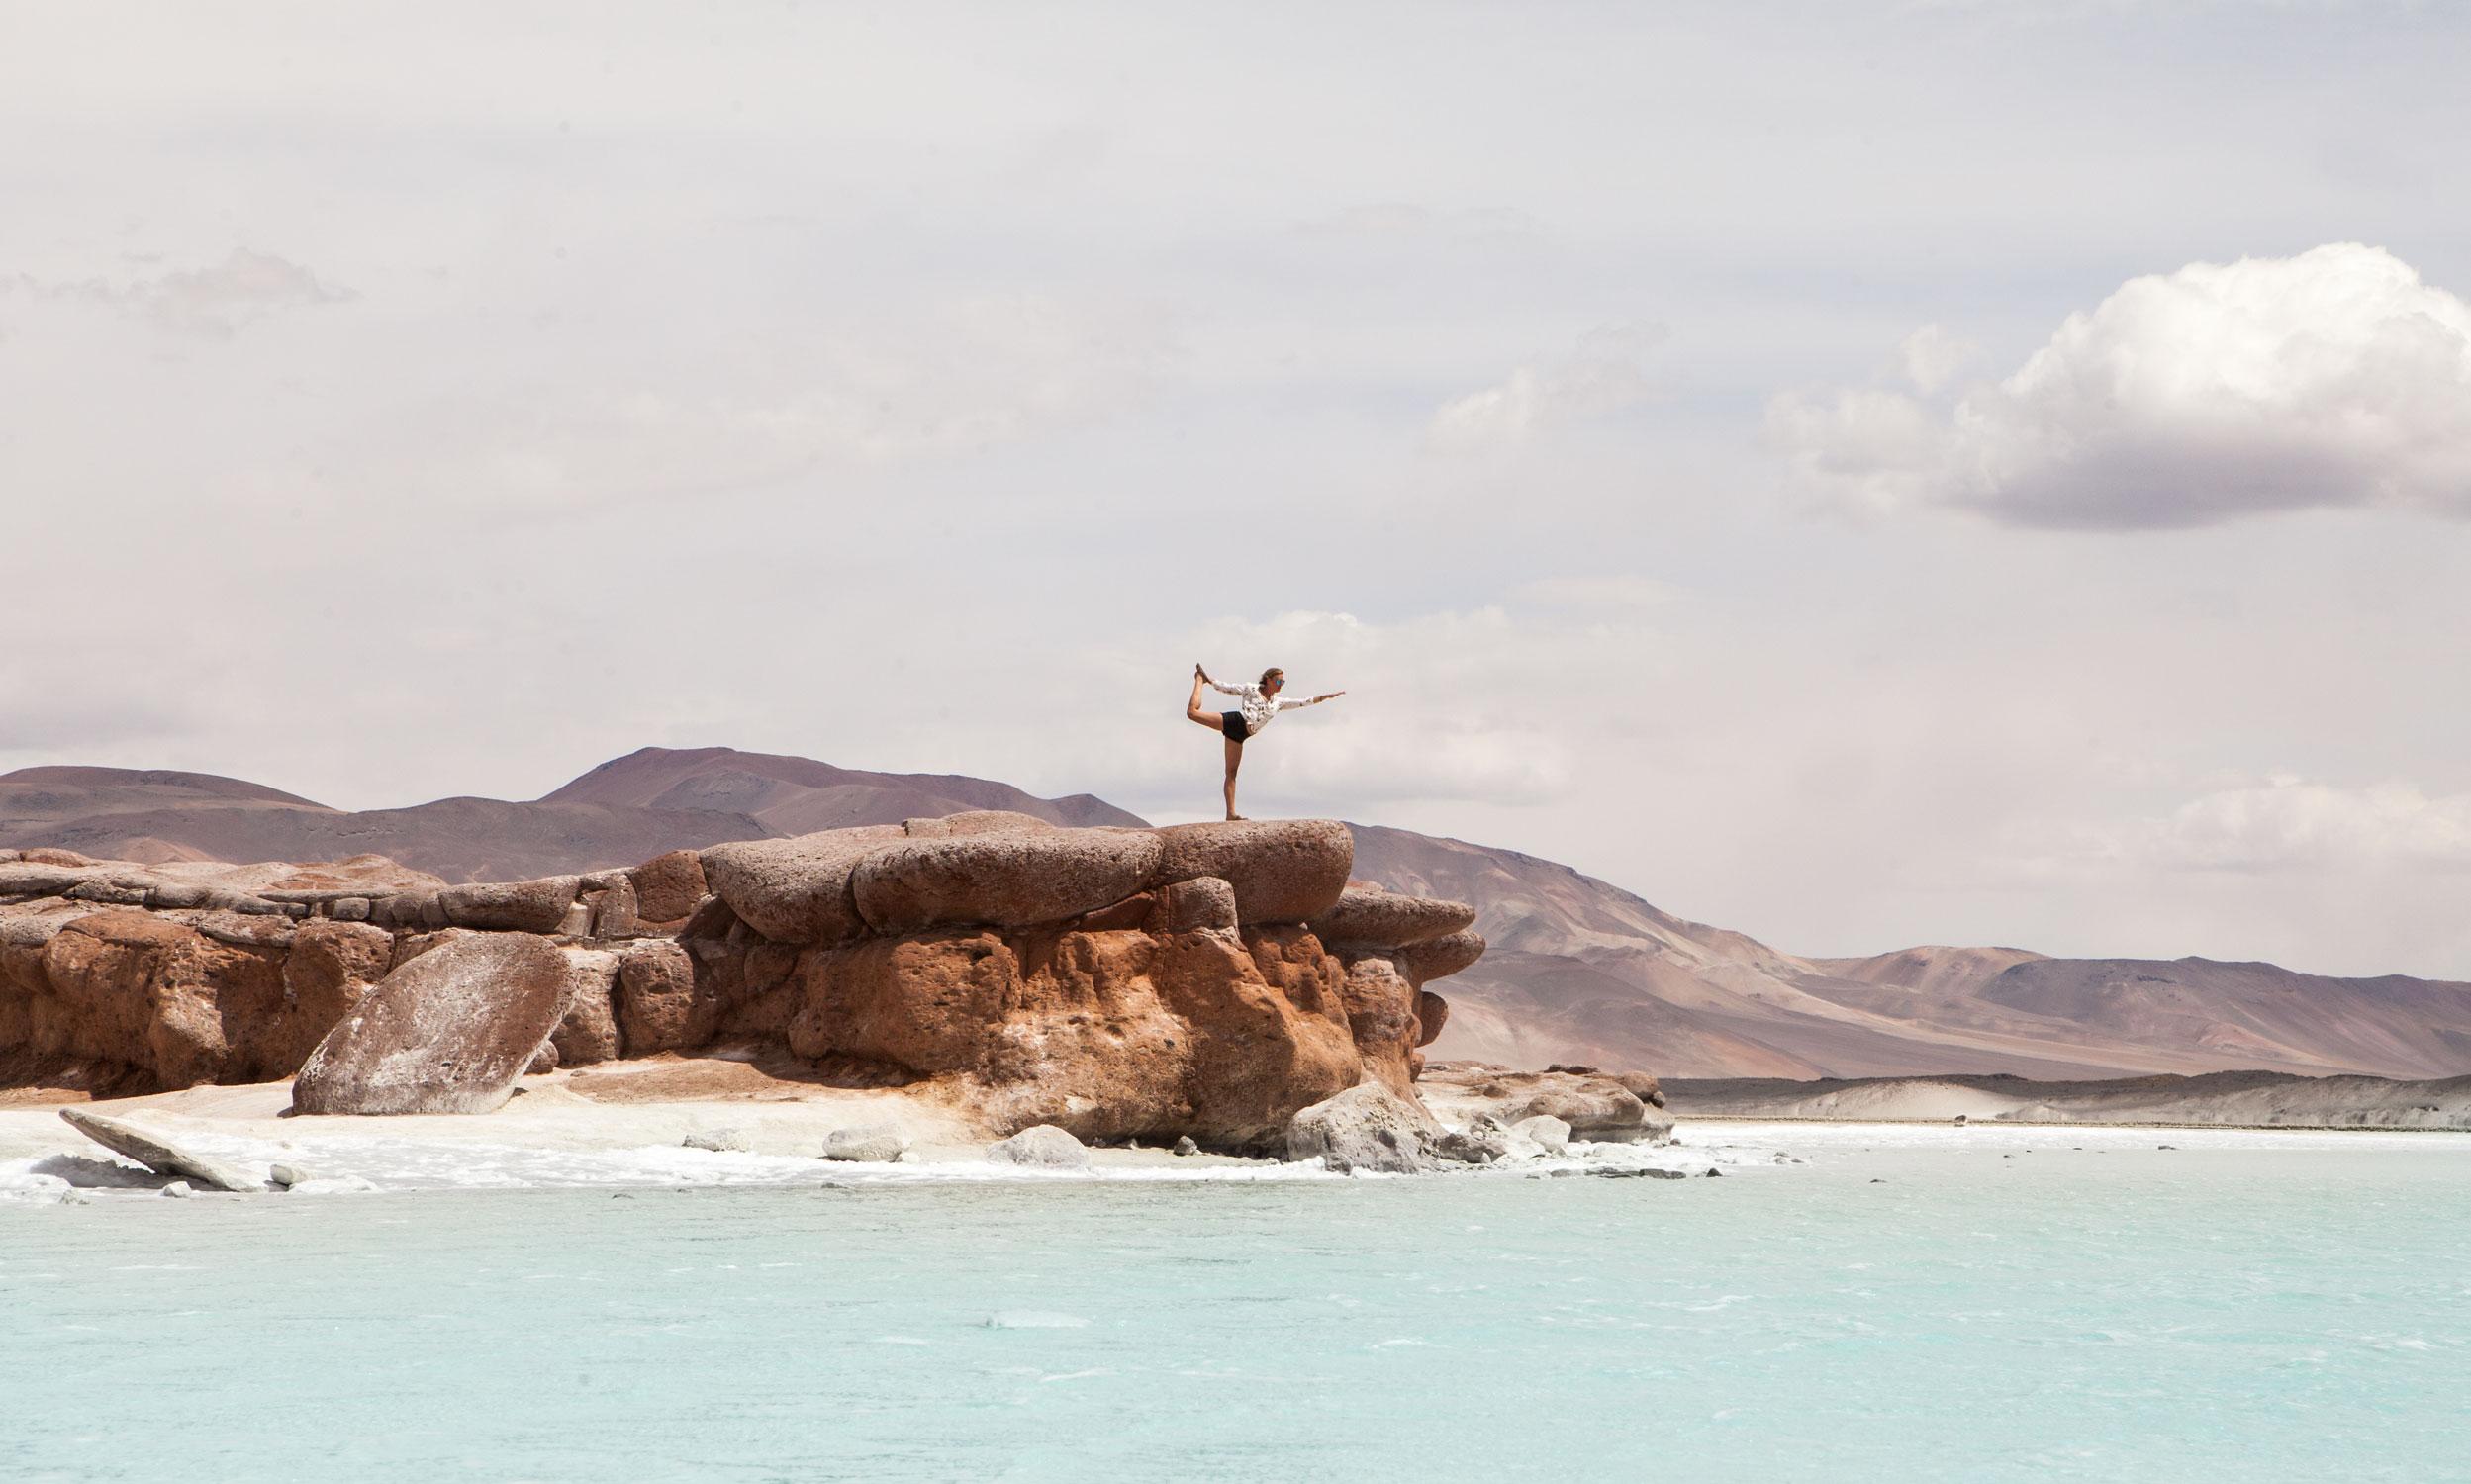 atacama-desert-chile-wander-south-piedras-rojas-Meg-yoga.jpg